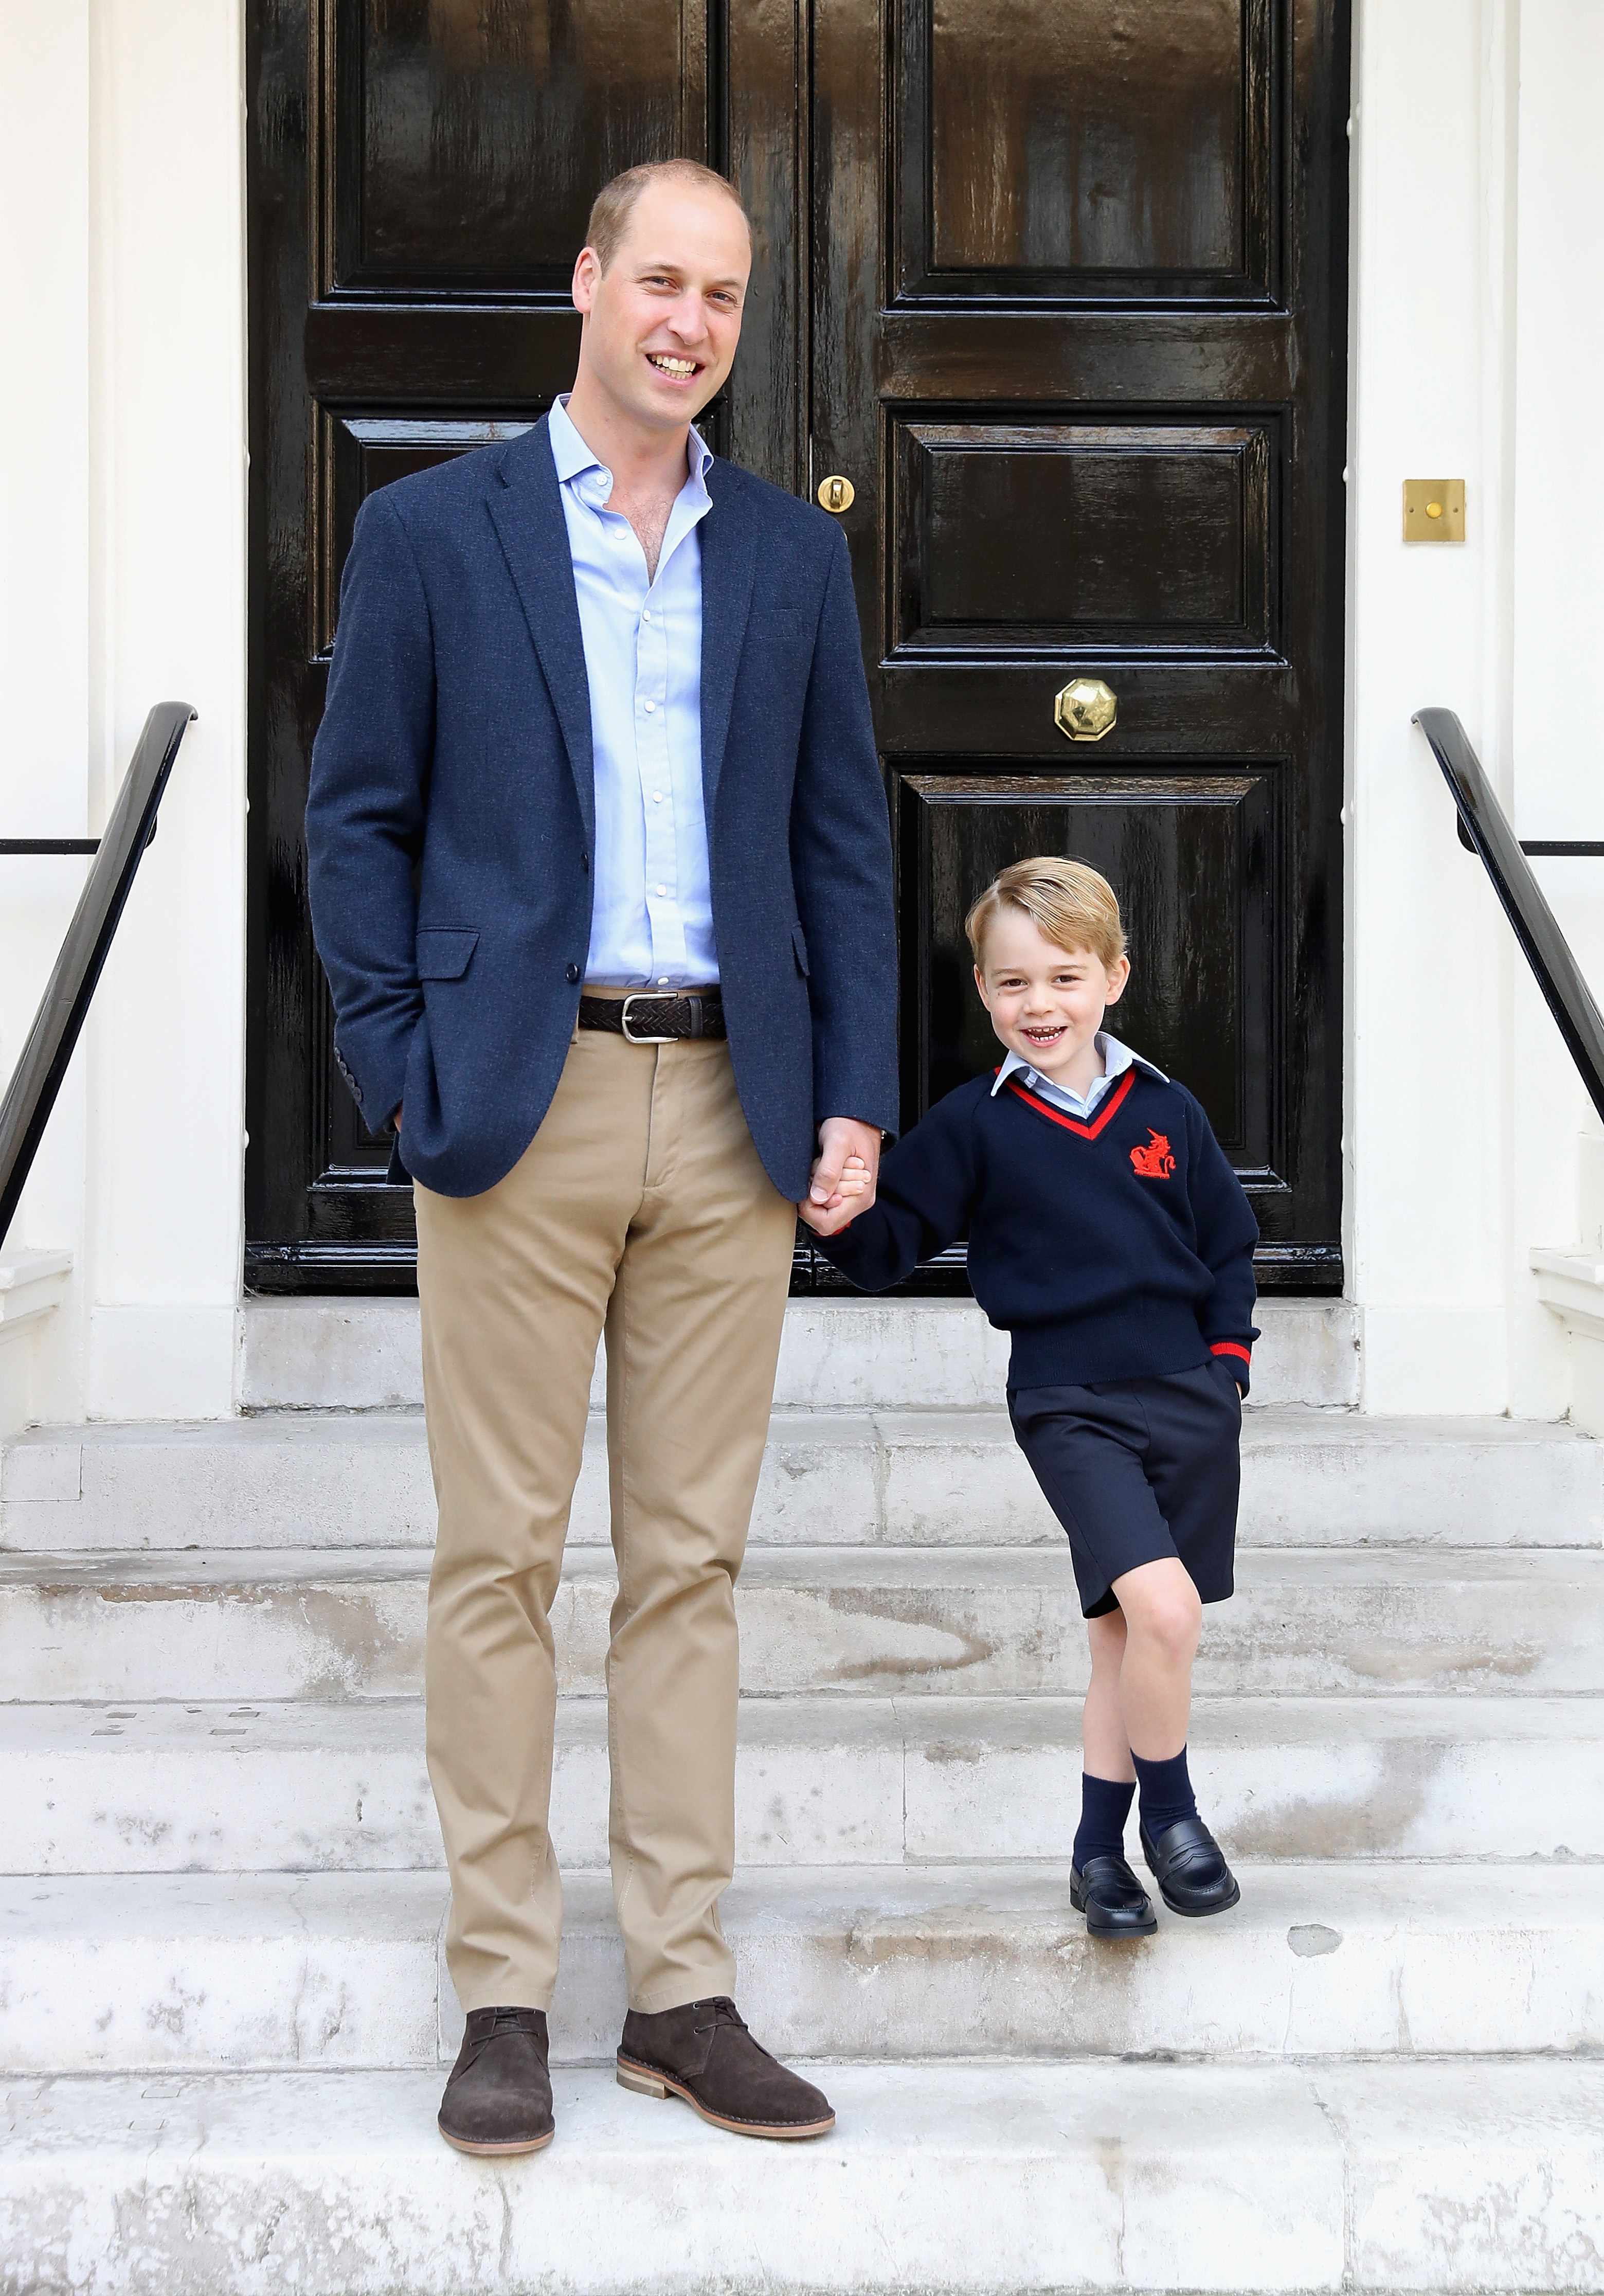 regras-de-estilo-familia-real-principe-george